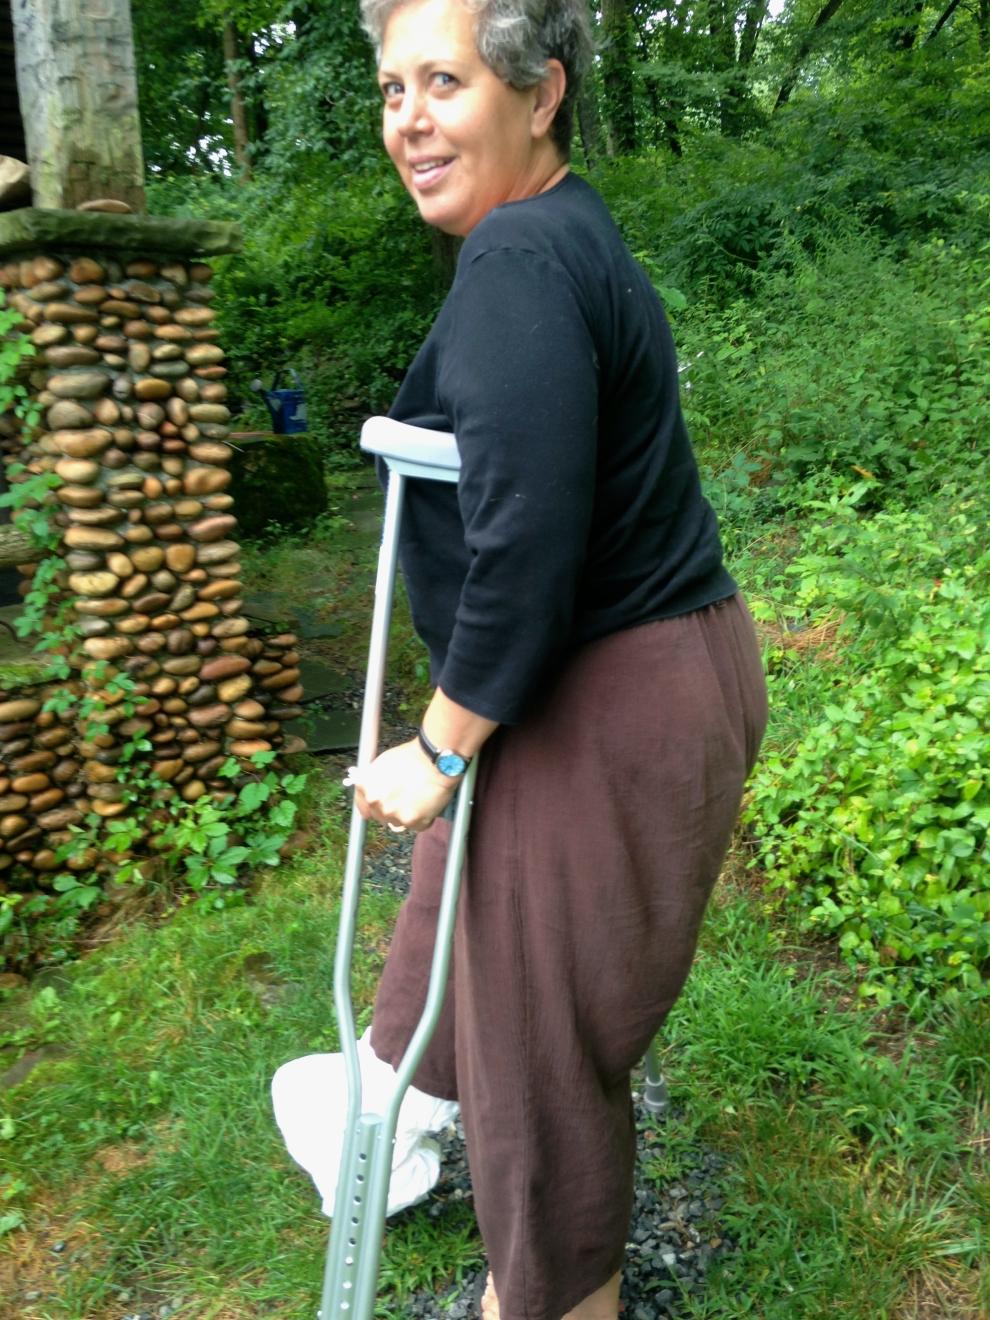 Jean on crutches